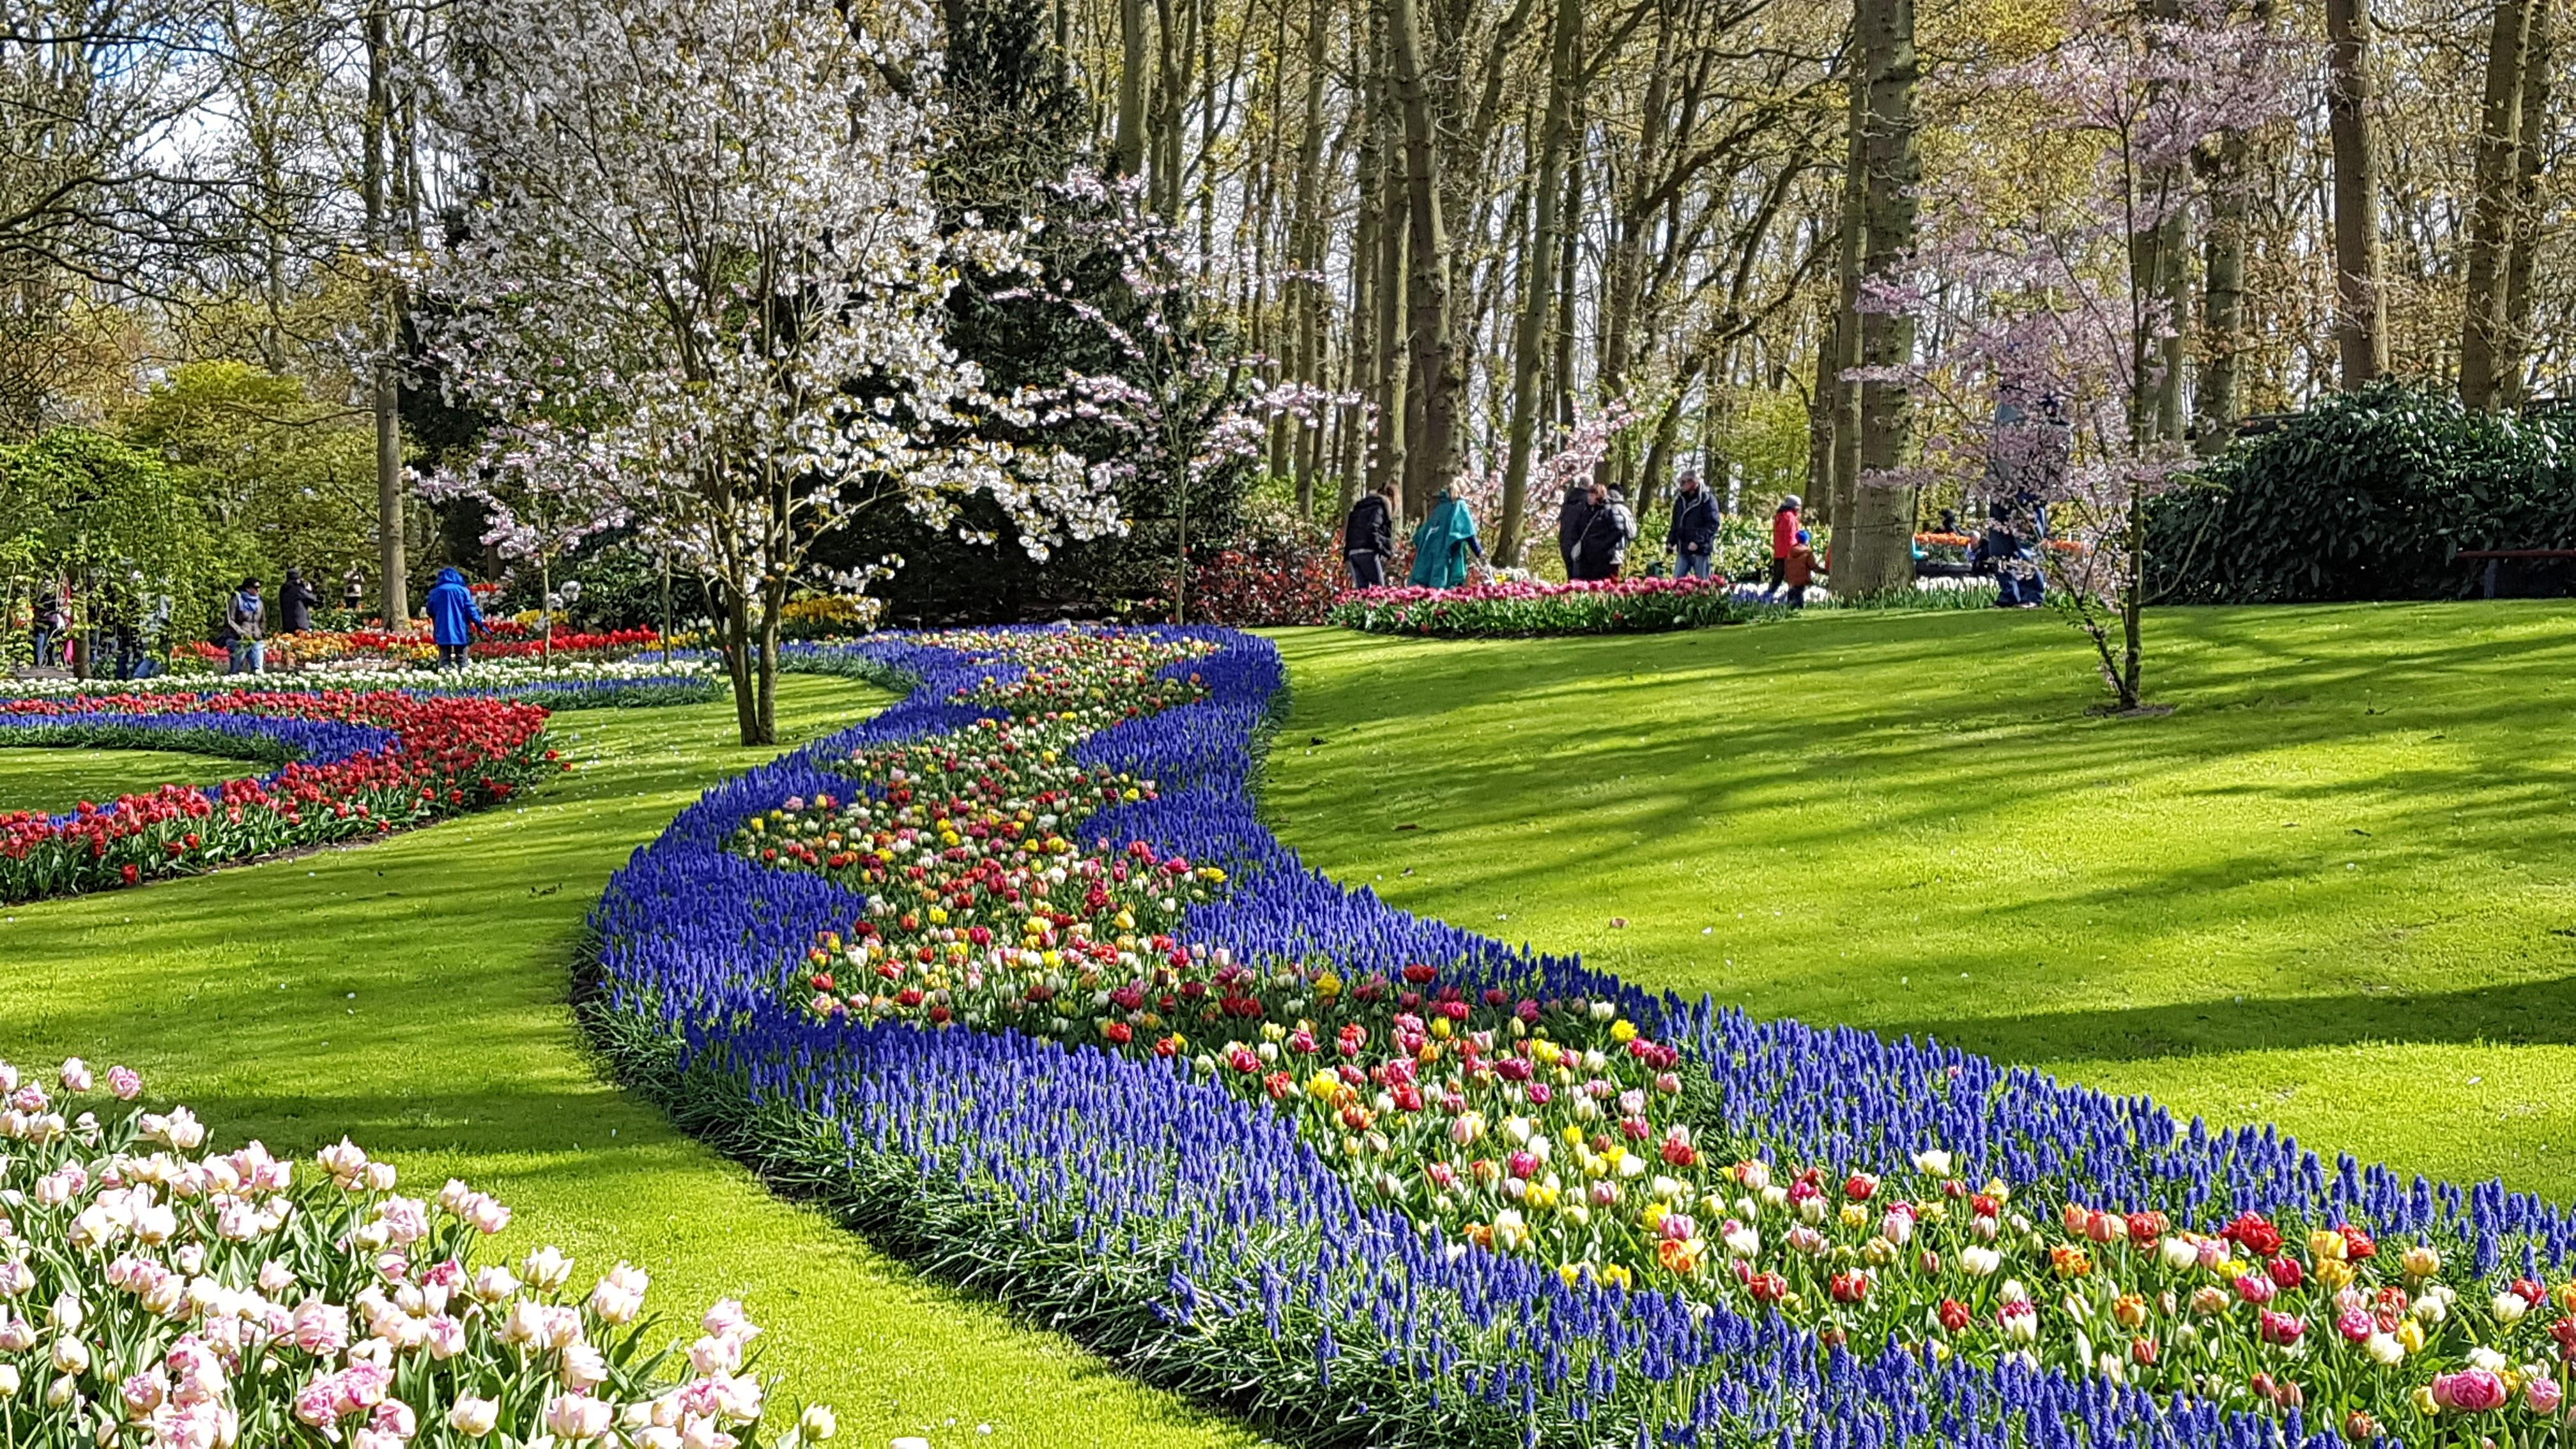 Colorful-tulip-flowers-Keukenhof-Holland, Colorful-tulip-flowers-Keukenhof-Holland